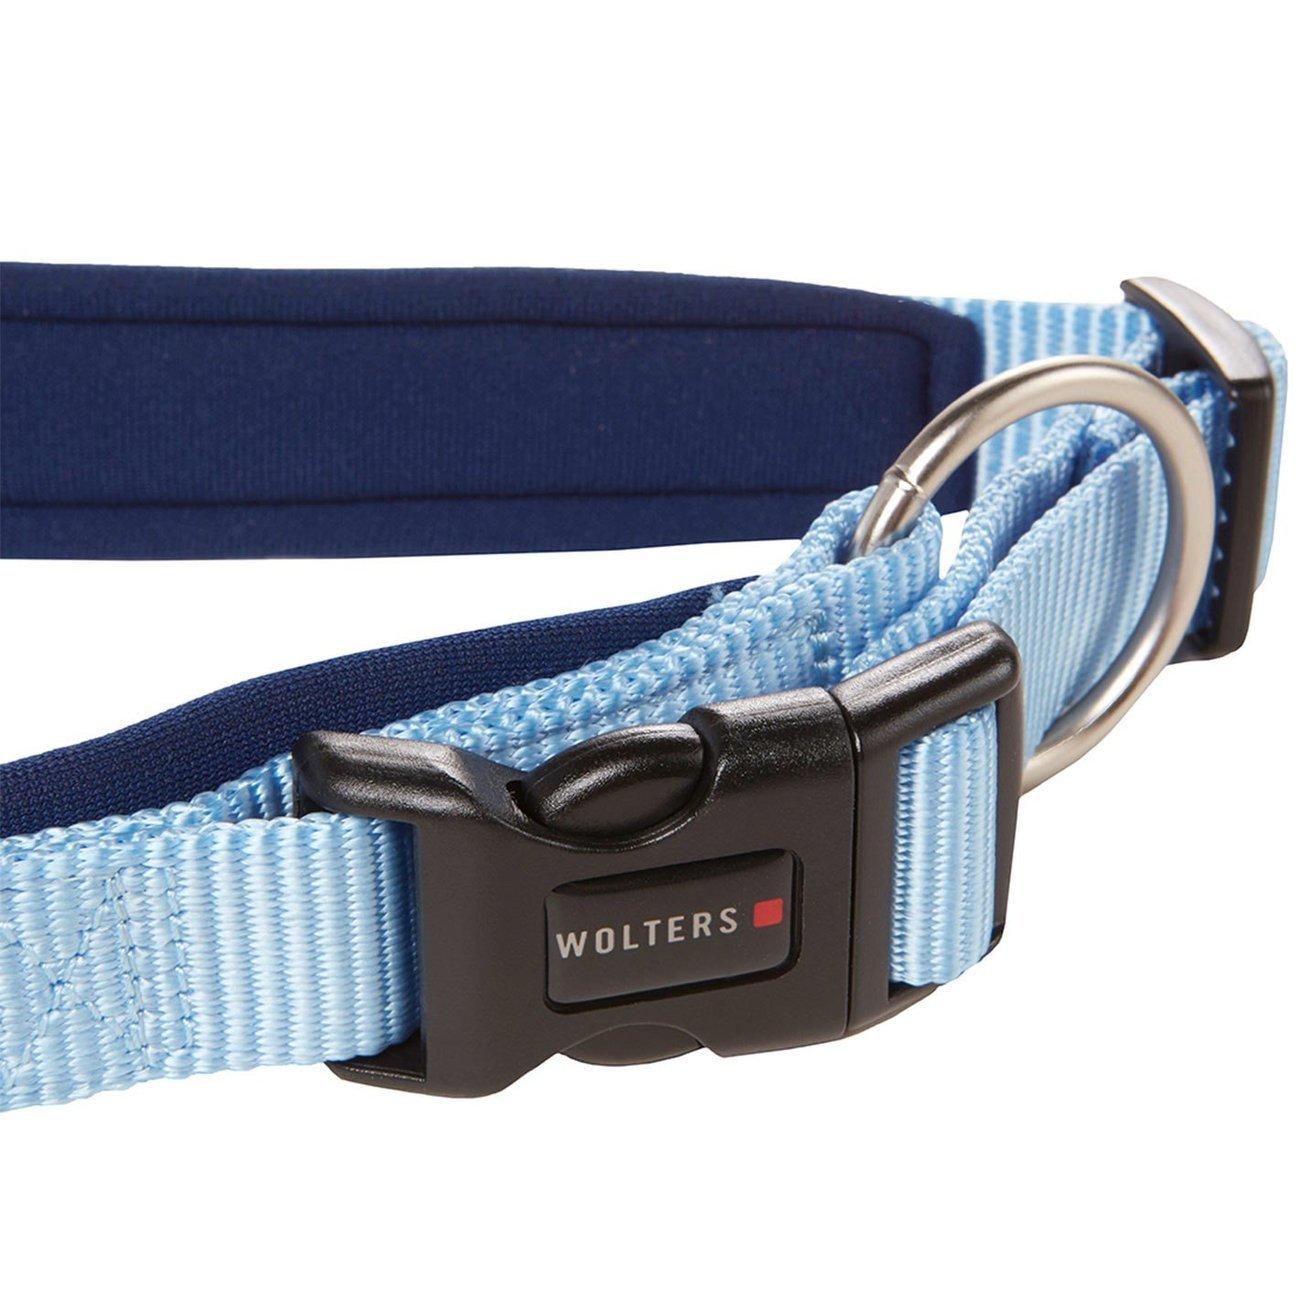 Wolters Halsband Professional Comfort Extra breit, Bild 11